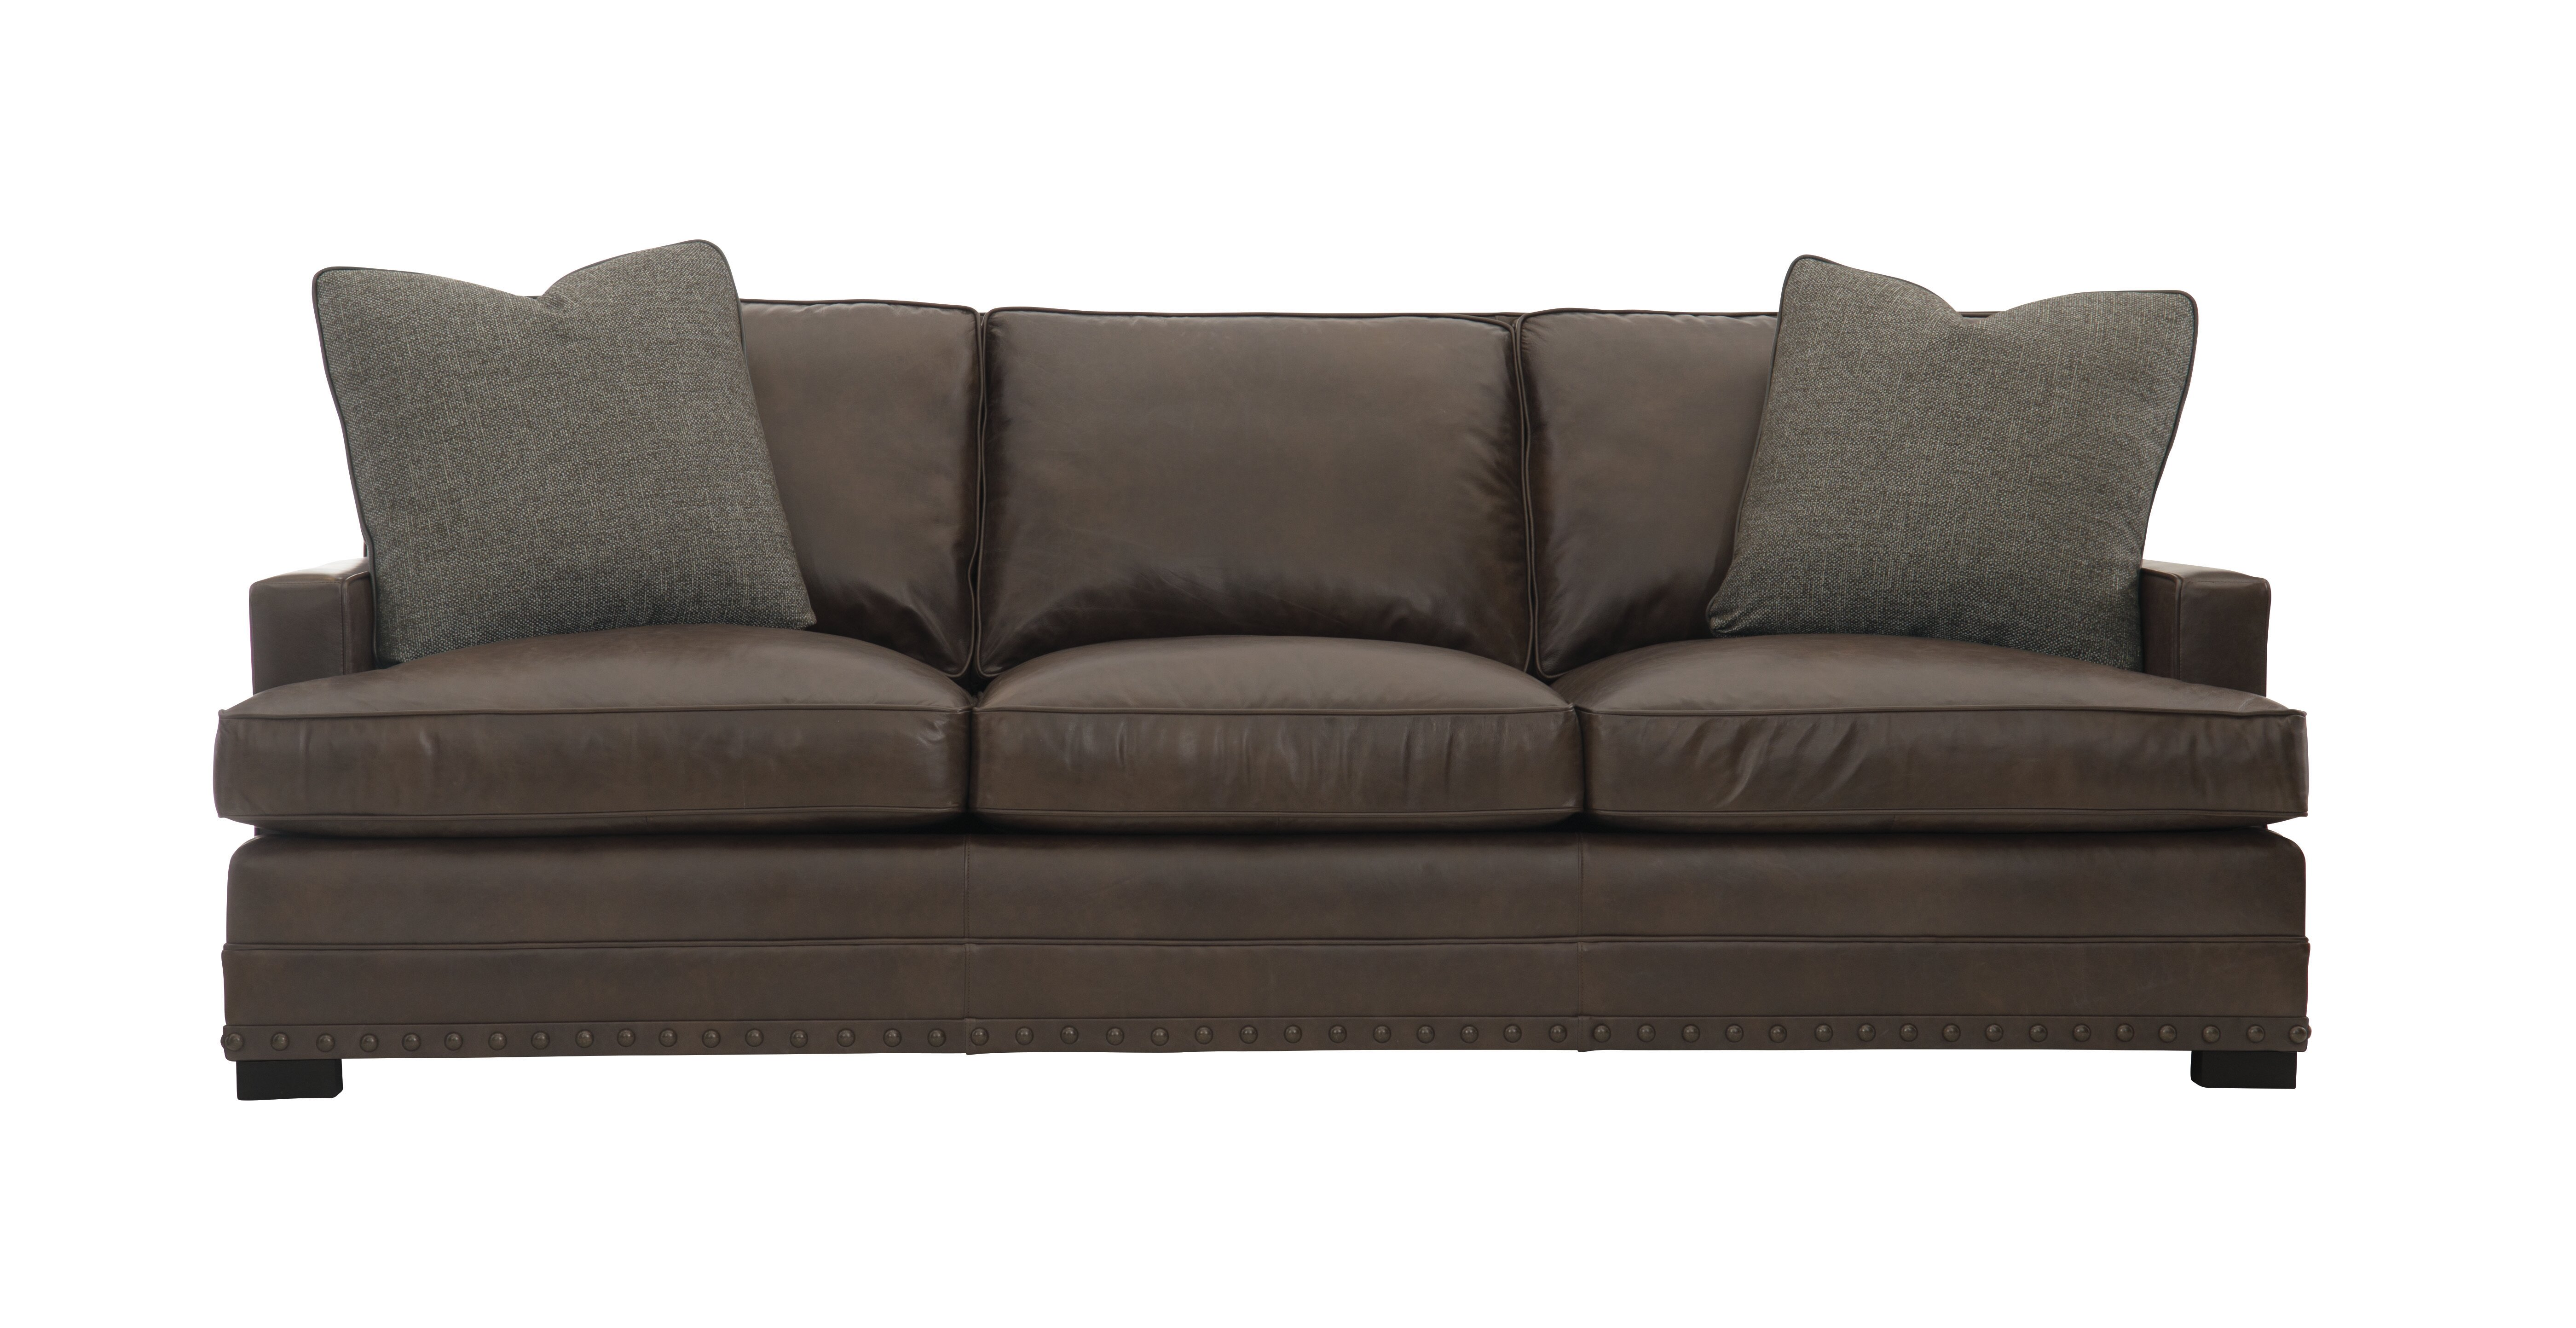 Bernhardt Cantor Genuine Leather 94 Recessed Arm Sofa Wayfair